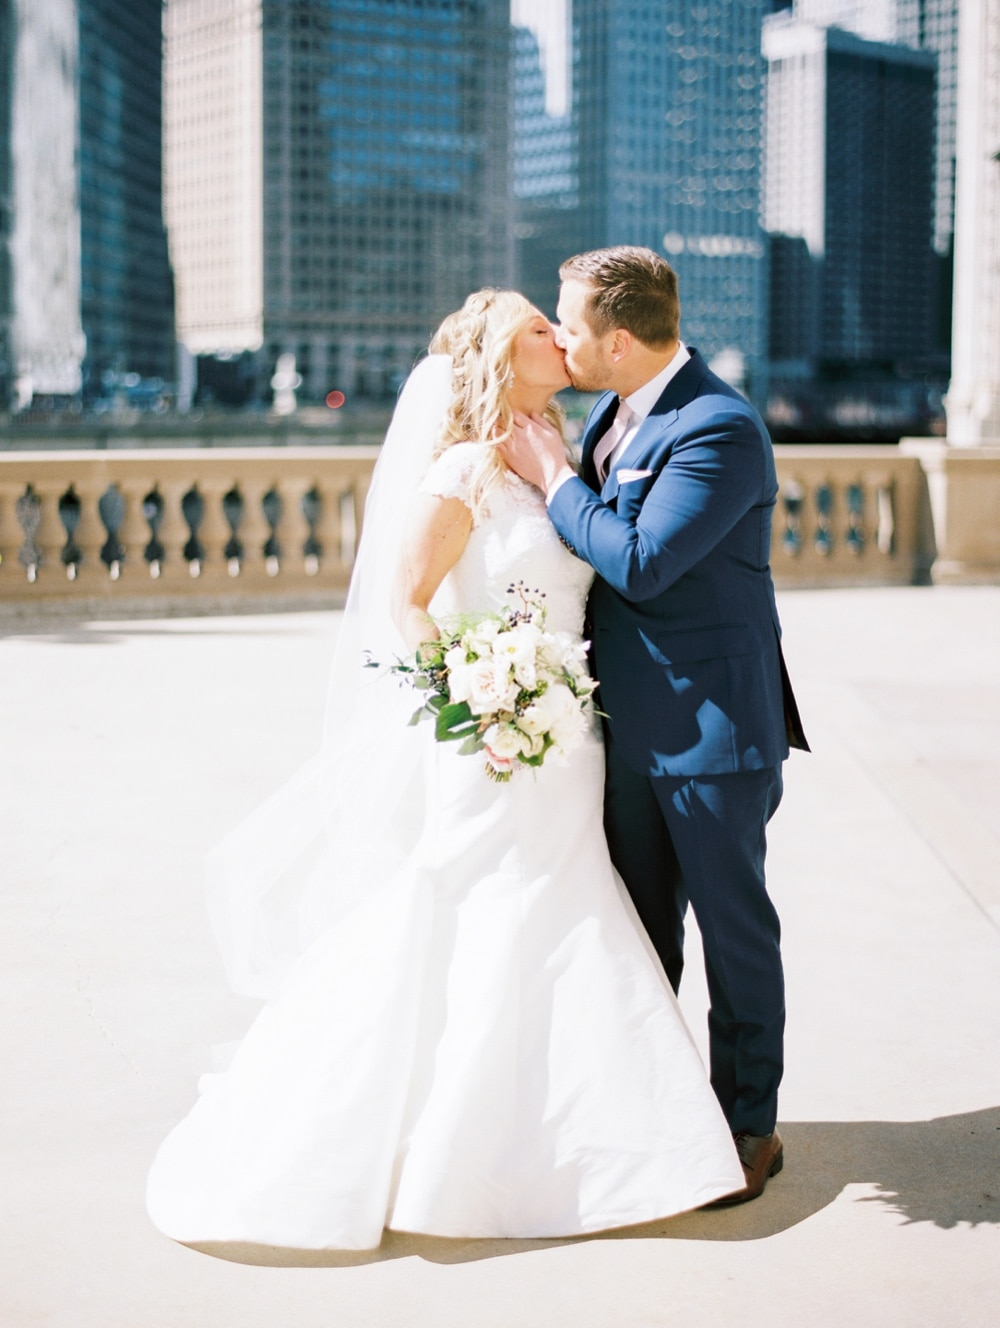 kristin-la-voie-photography-Cafe-Brauer-Chicago-Wedding-Photographer-15